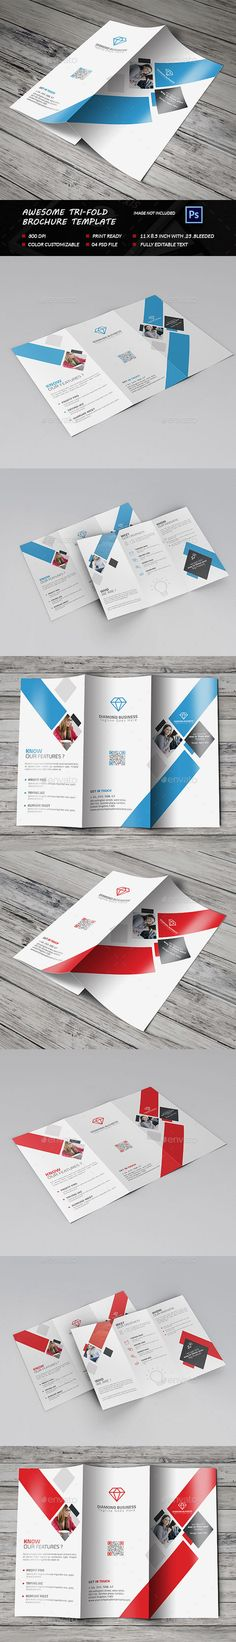 Awesome Tri-fold Brochure